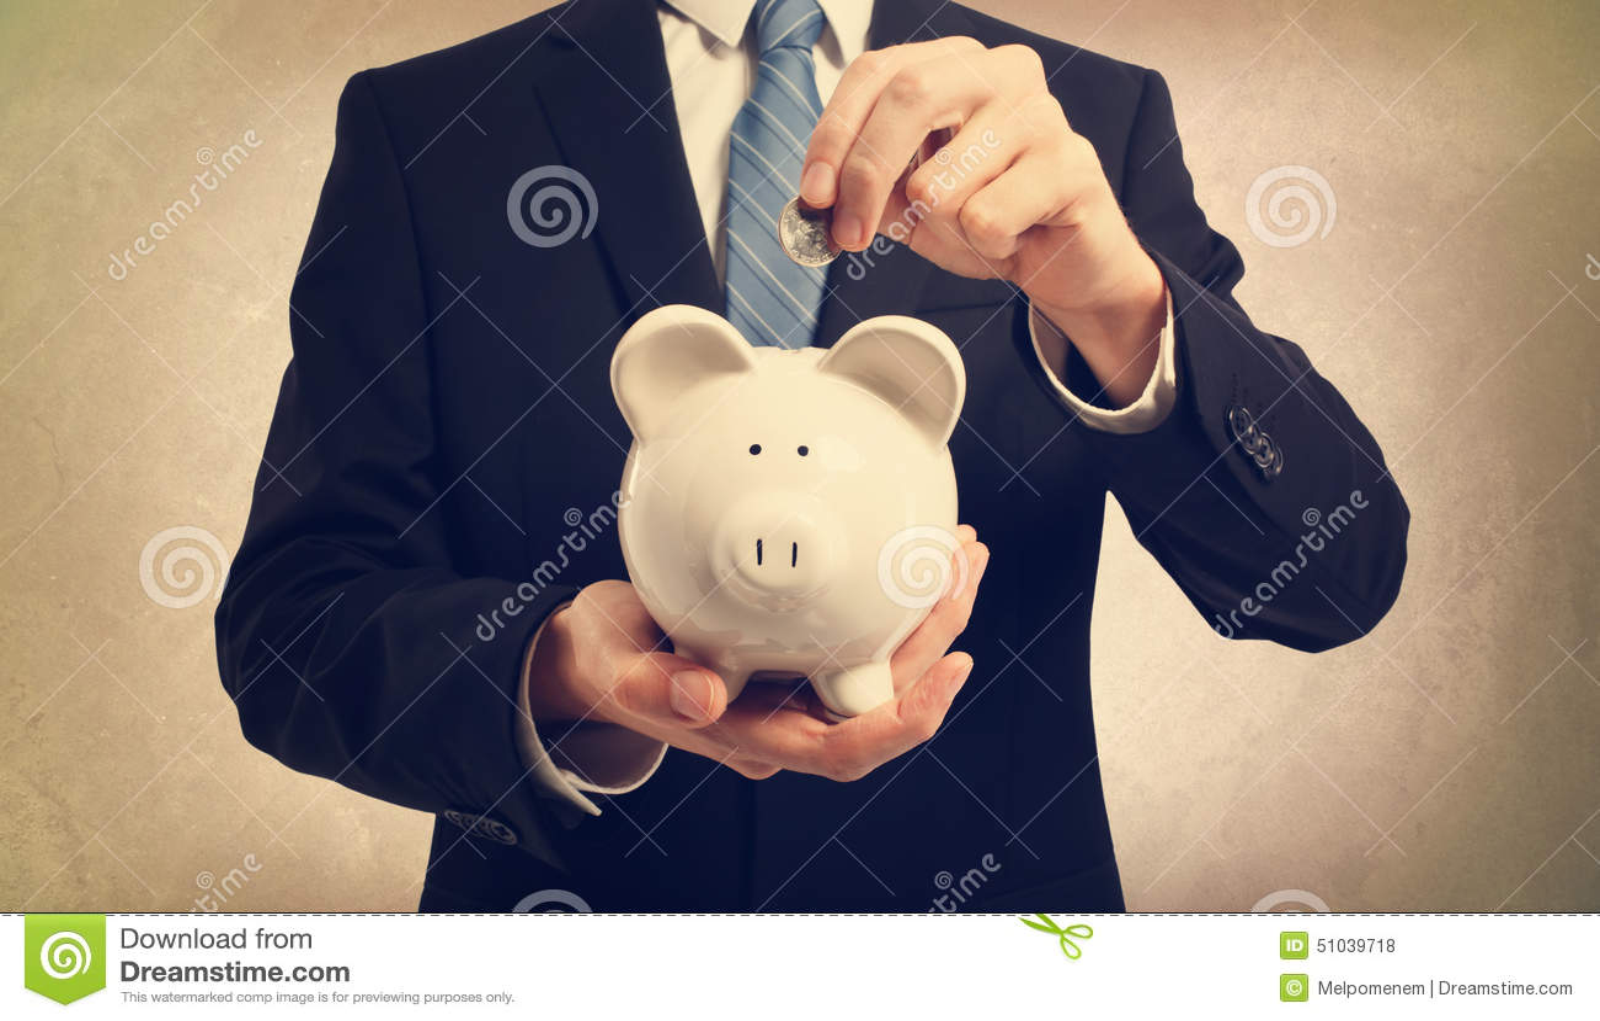 Young man depositing money in piggy bank